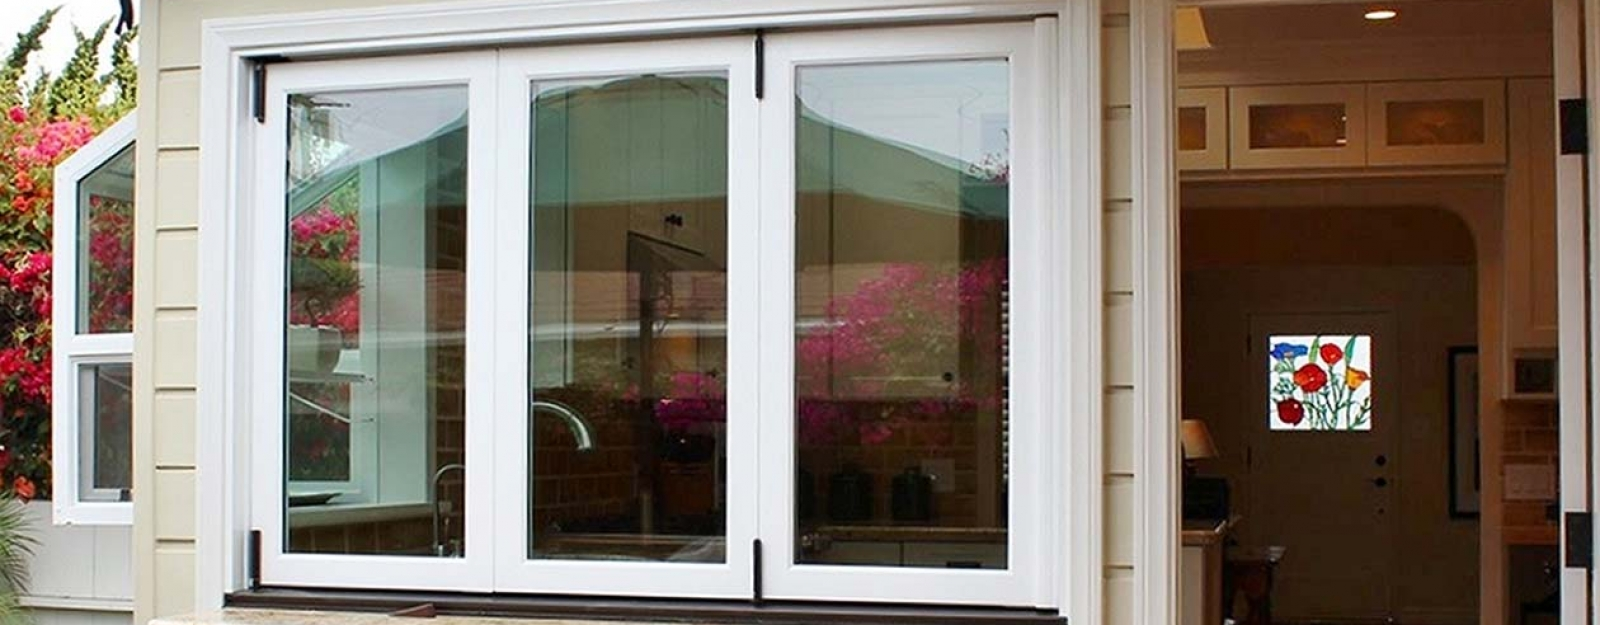 Folding Window Series 2200 Windor Systems